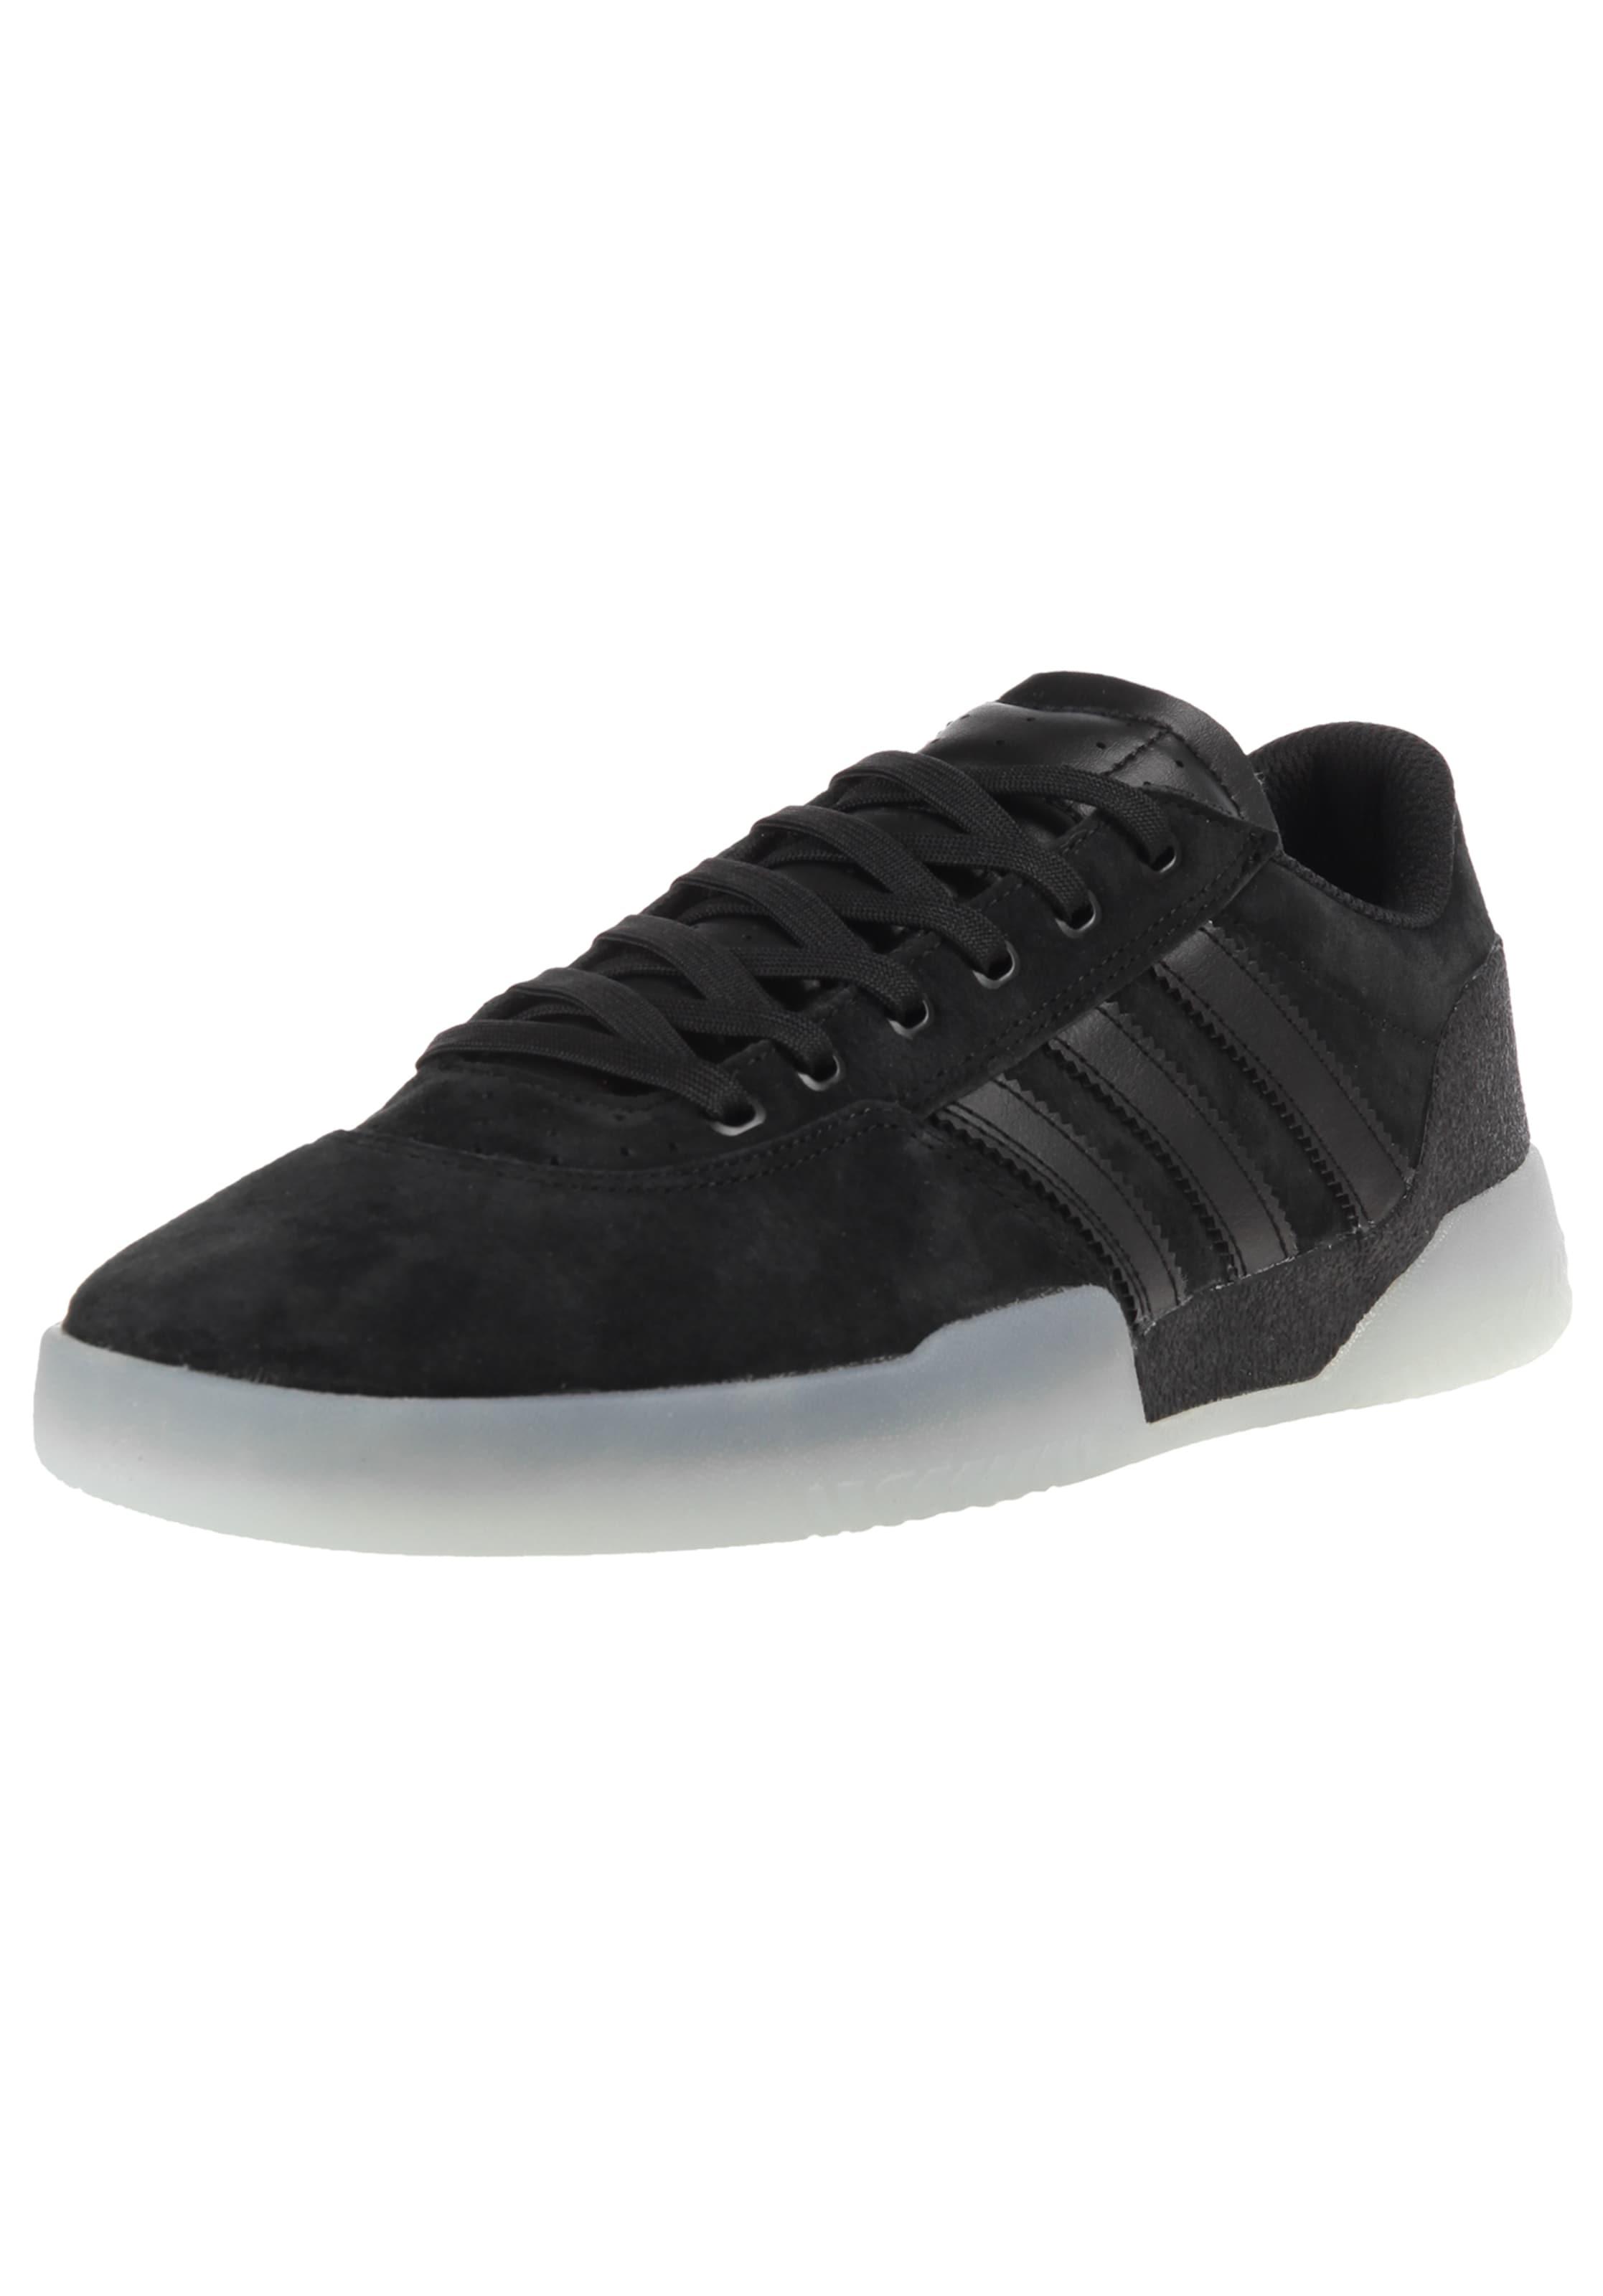 ADIDAS ORIGINALS Sneaker City Cup Hohe Qualität